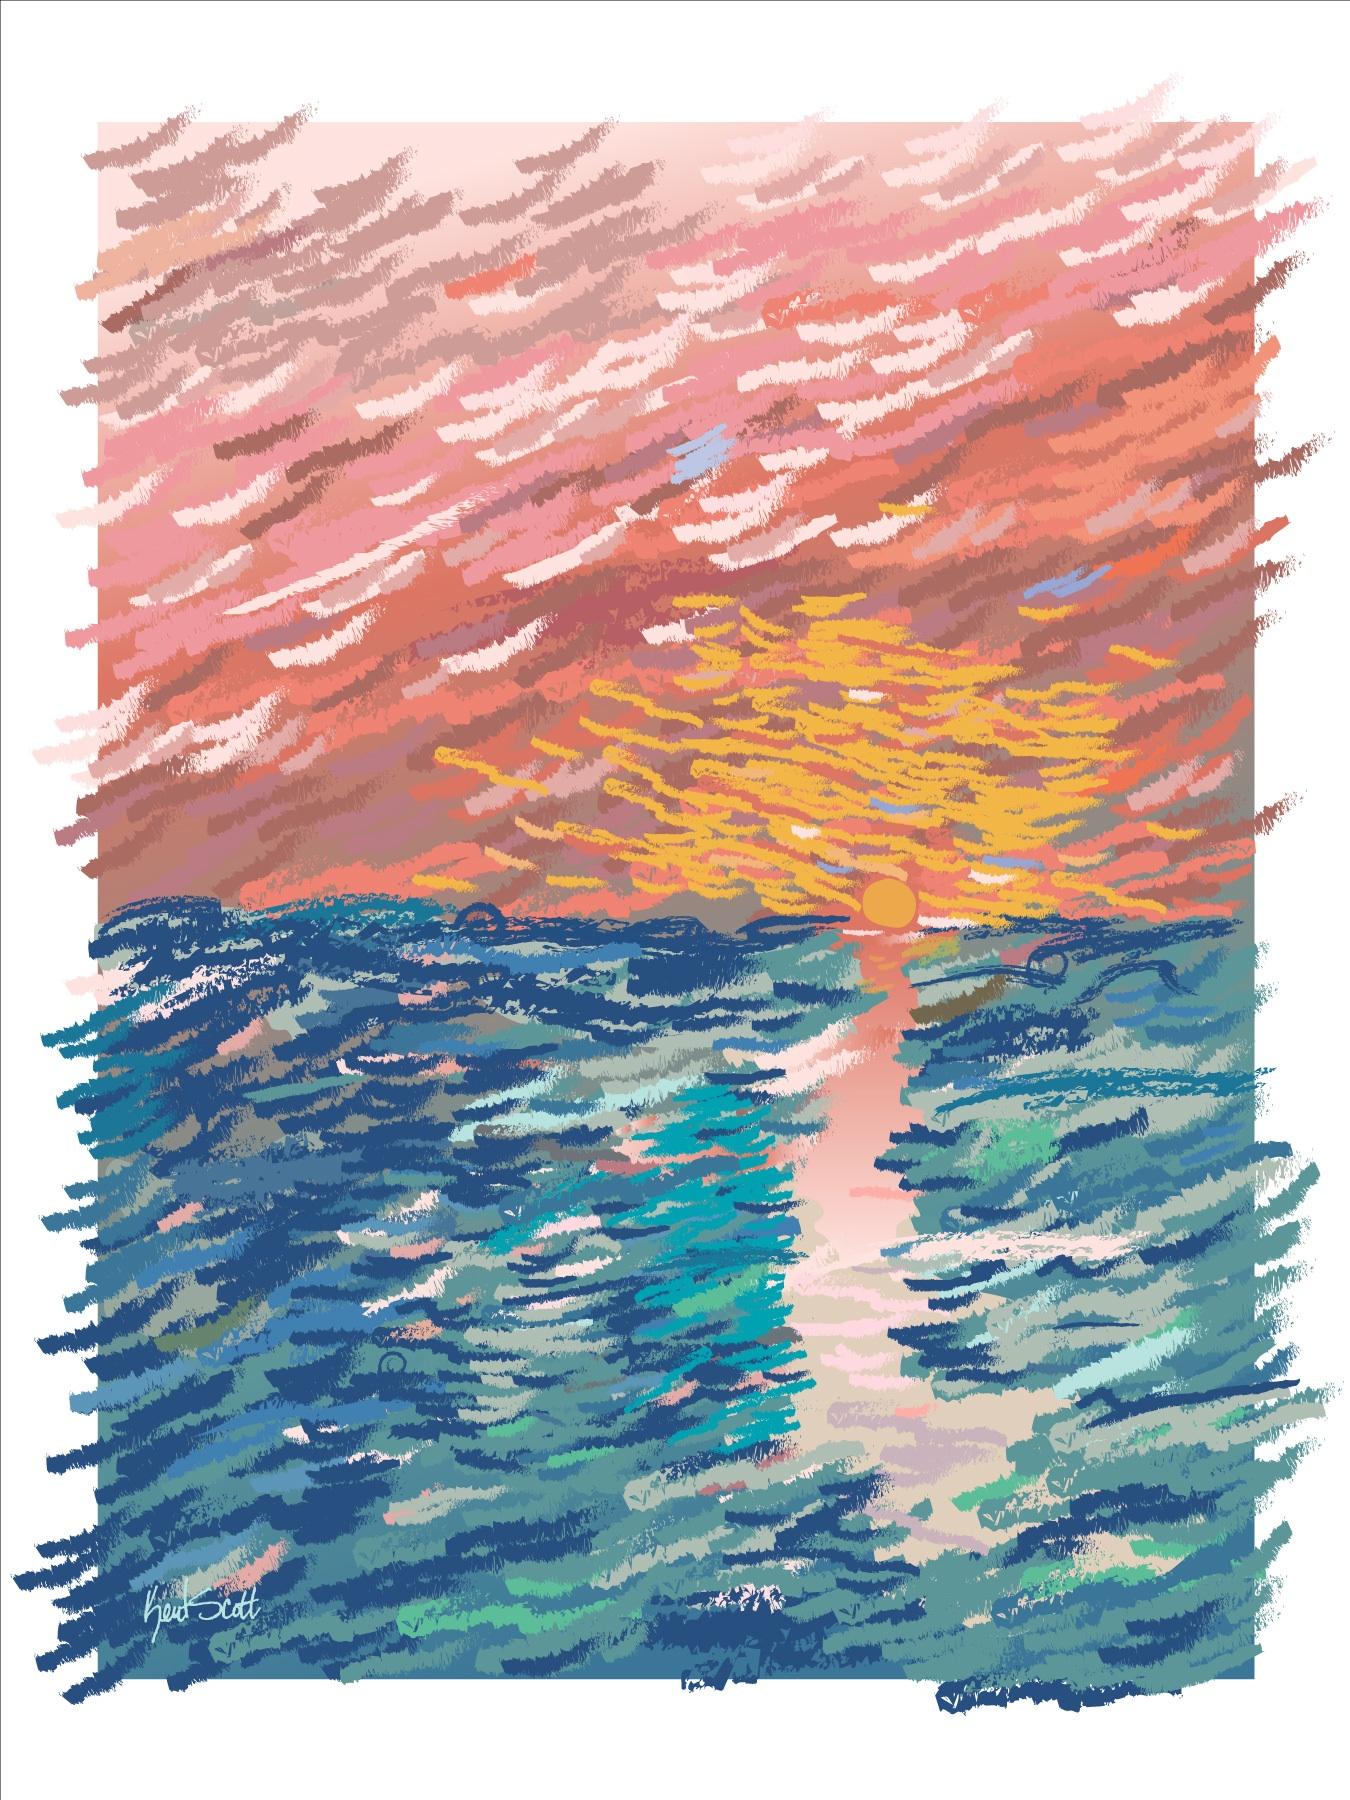 Impressionistic Post Card by Kent Scott